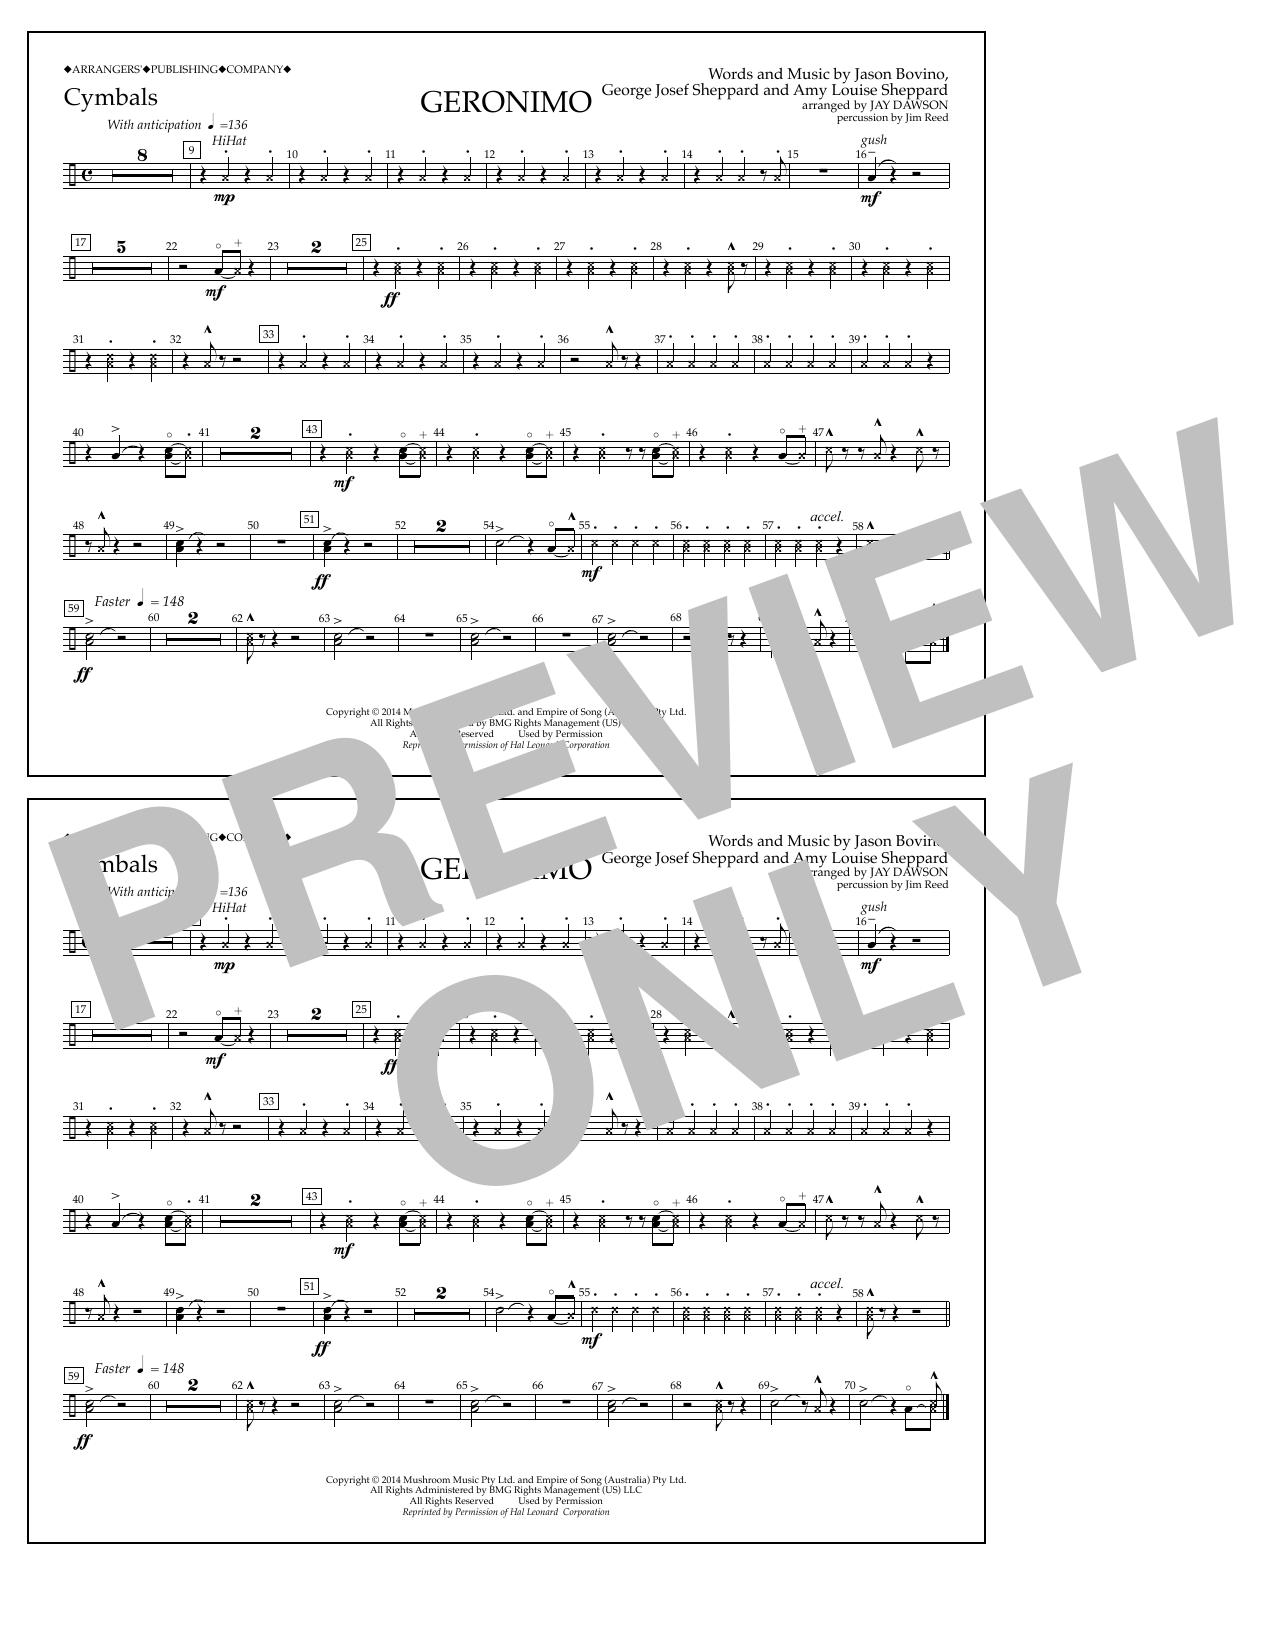 Geronimo - Cymbals Sheet Music